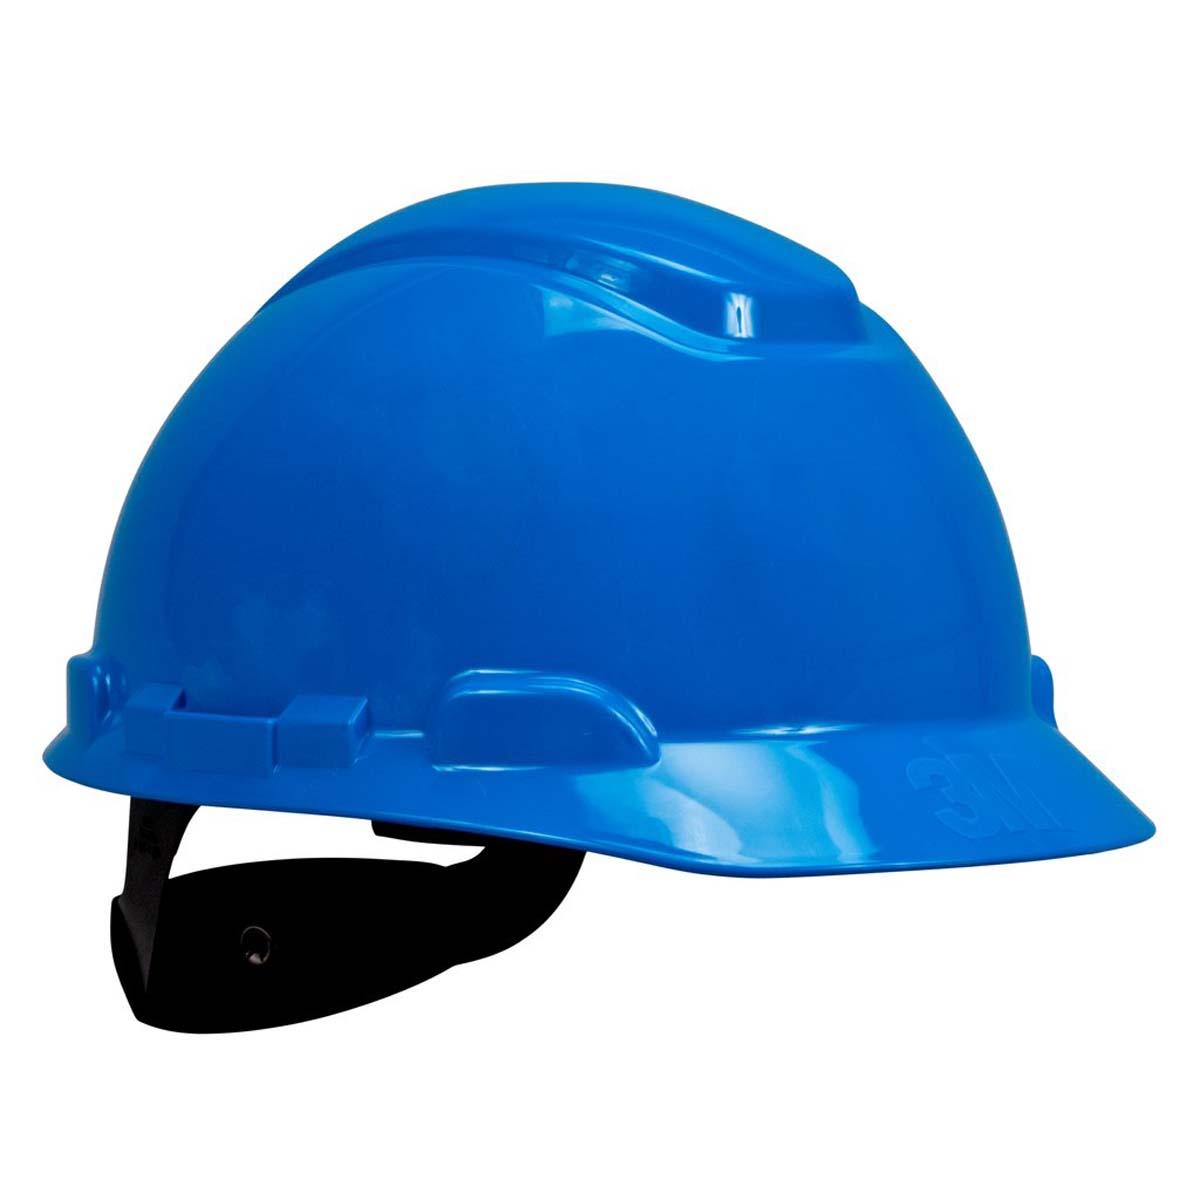 3M Hard Hat H-703R, Blue 4-Point Ratchet Suspension,